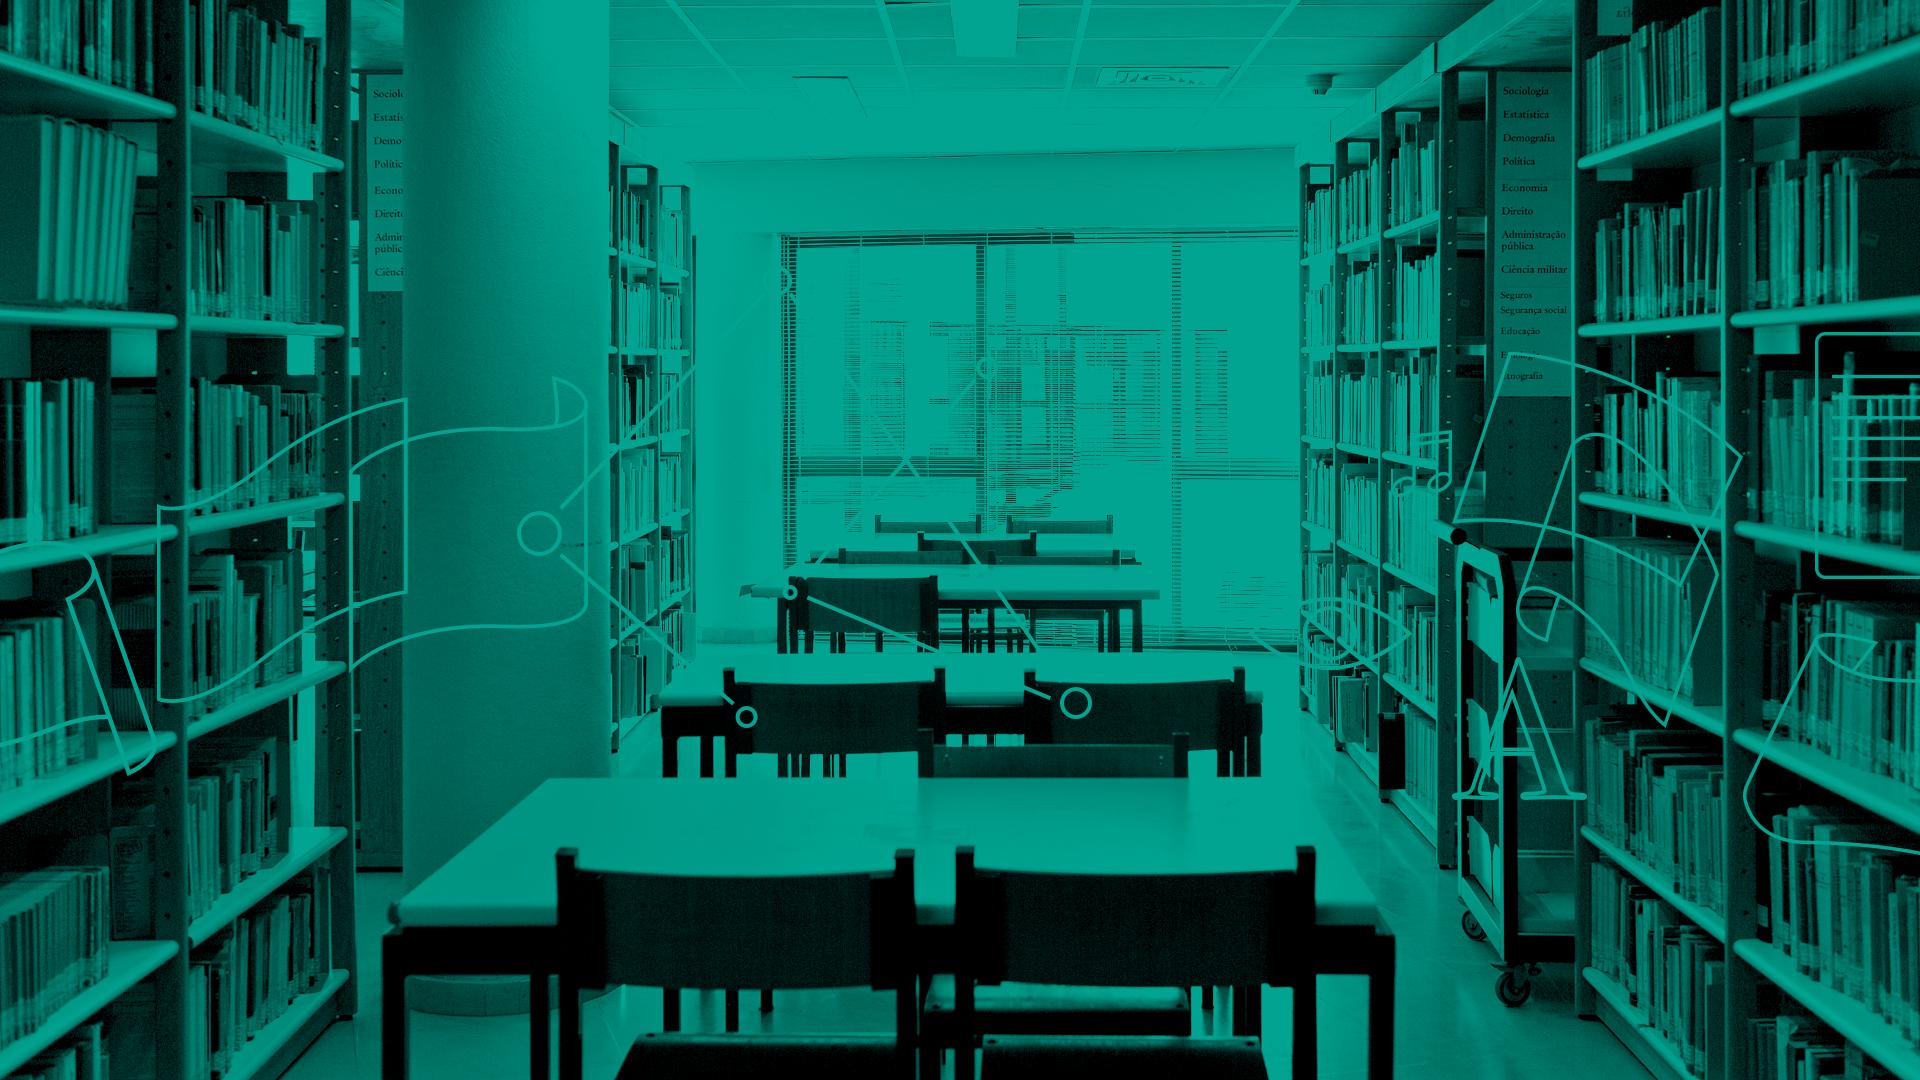 Biblioteca Vitorino Magalhães Godinho